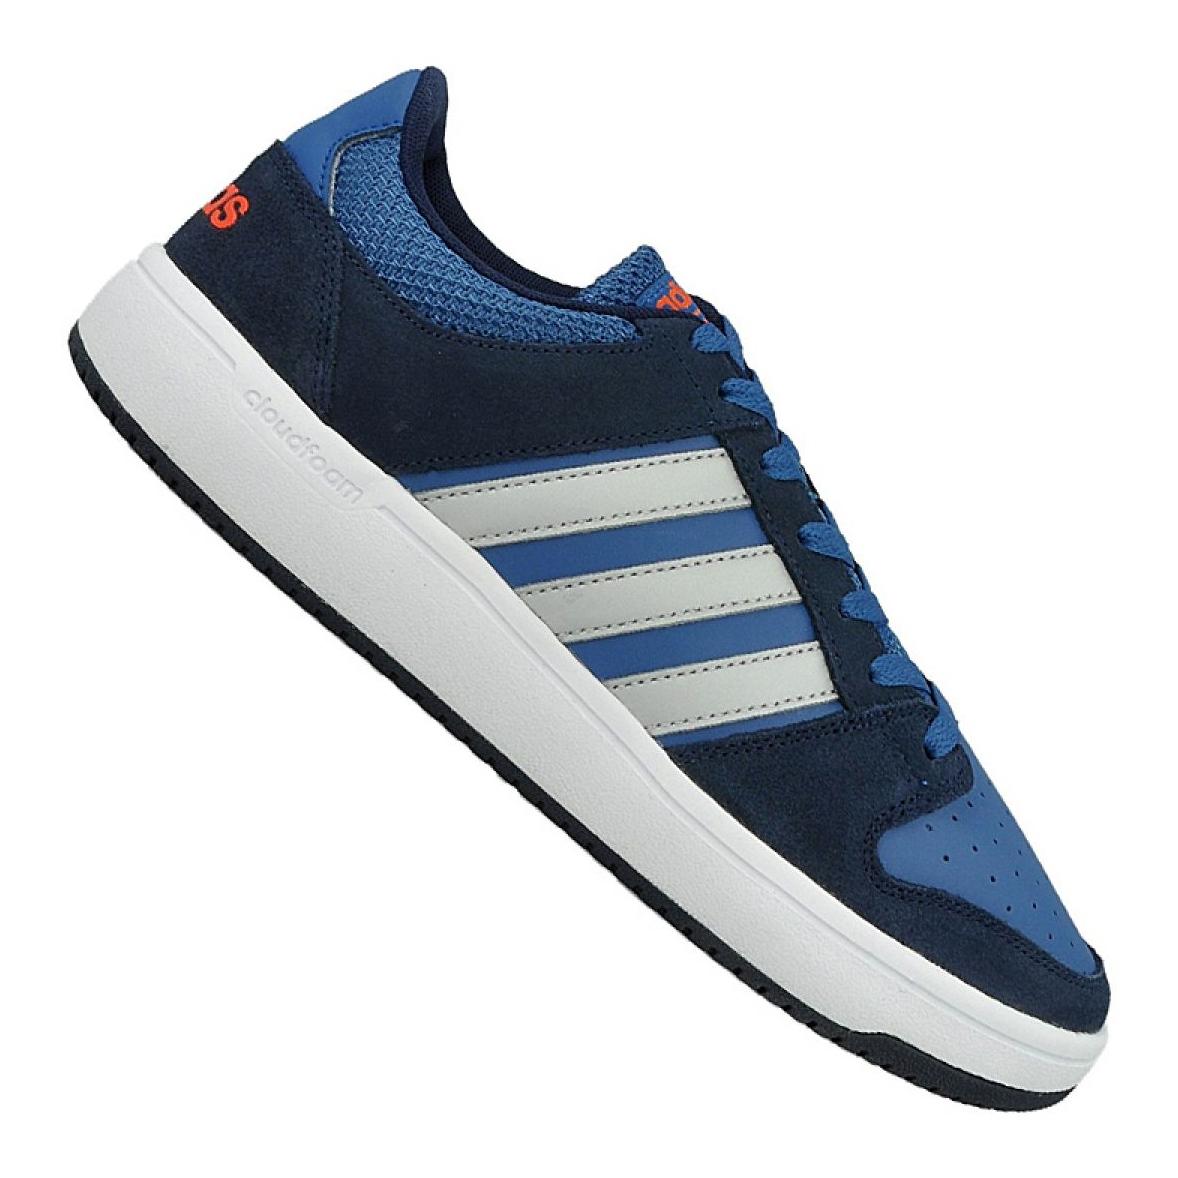 ADIDAS CLOUDFOAM SUPER Daily M B74307 Schuhe schwarz EUR